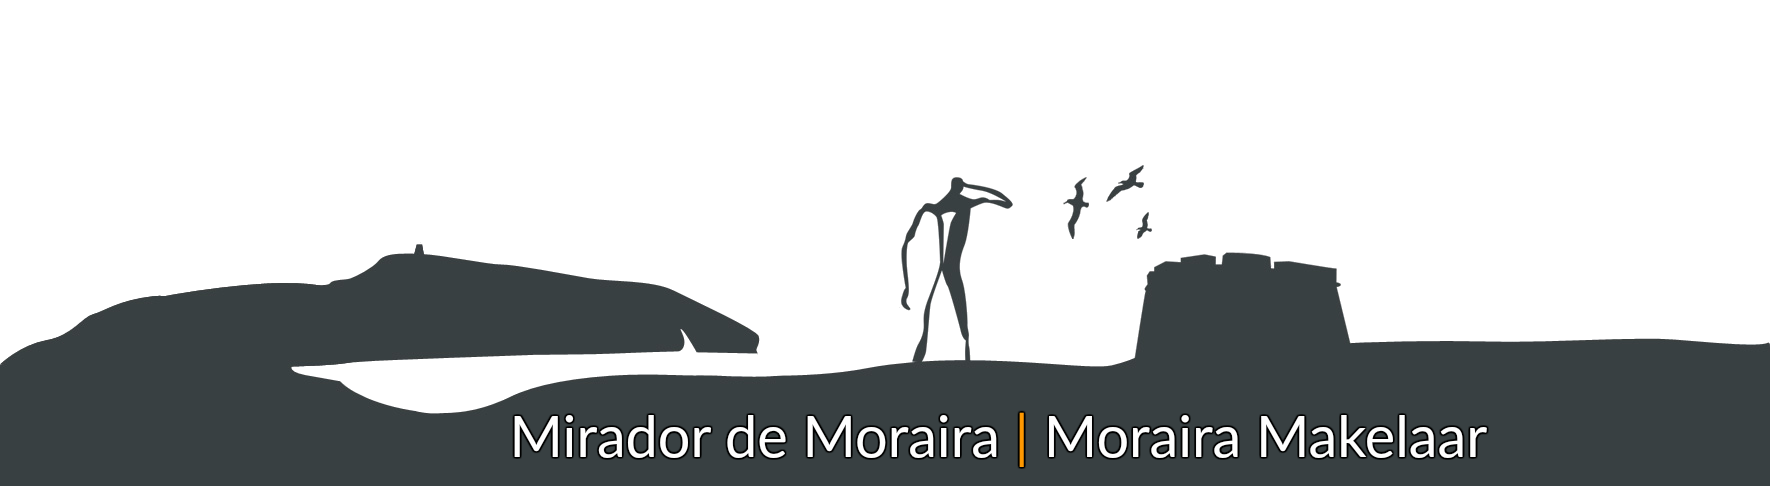 Nederlandse makelaar in Moraira